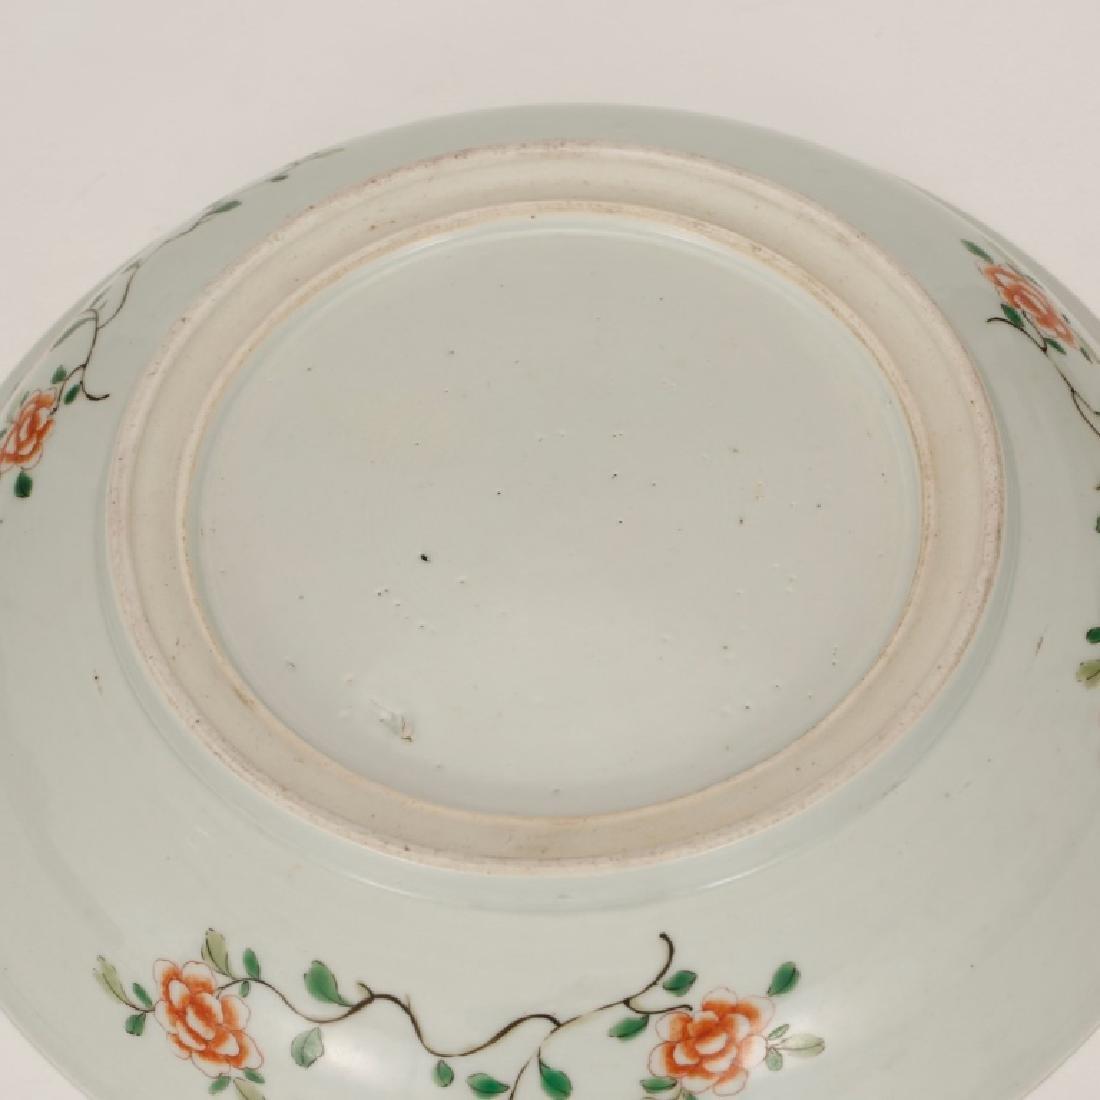 Chinese Qing Porcelain Famille Verte Plate - 7